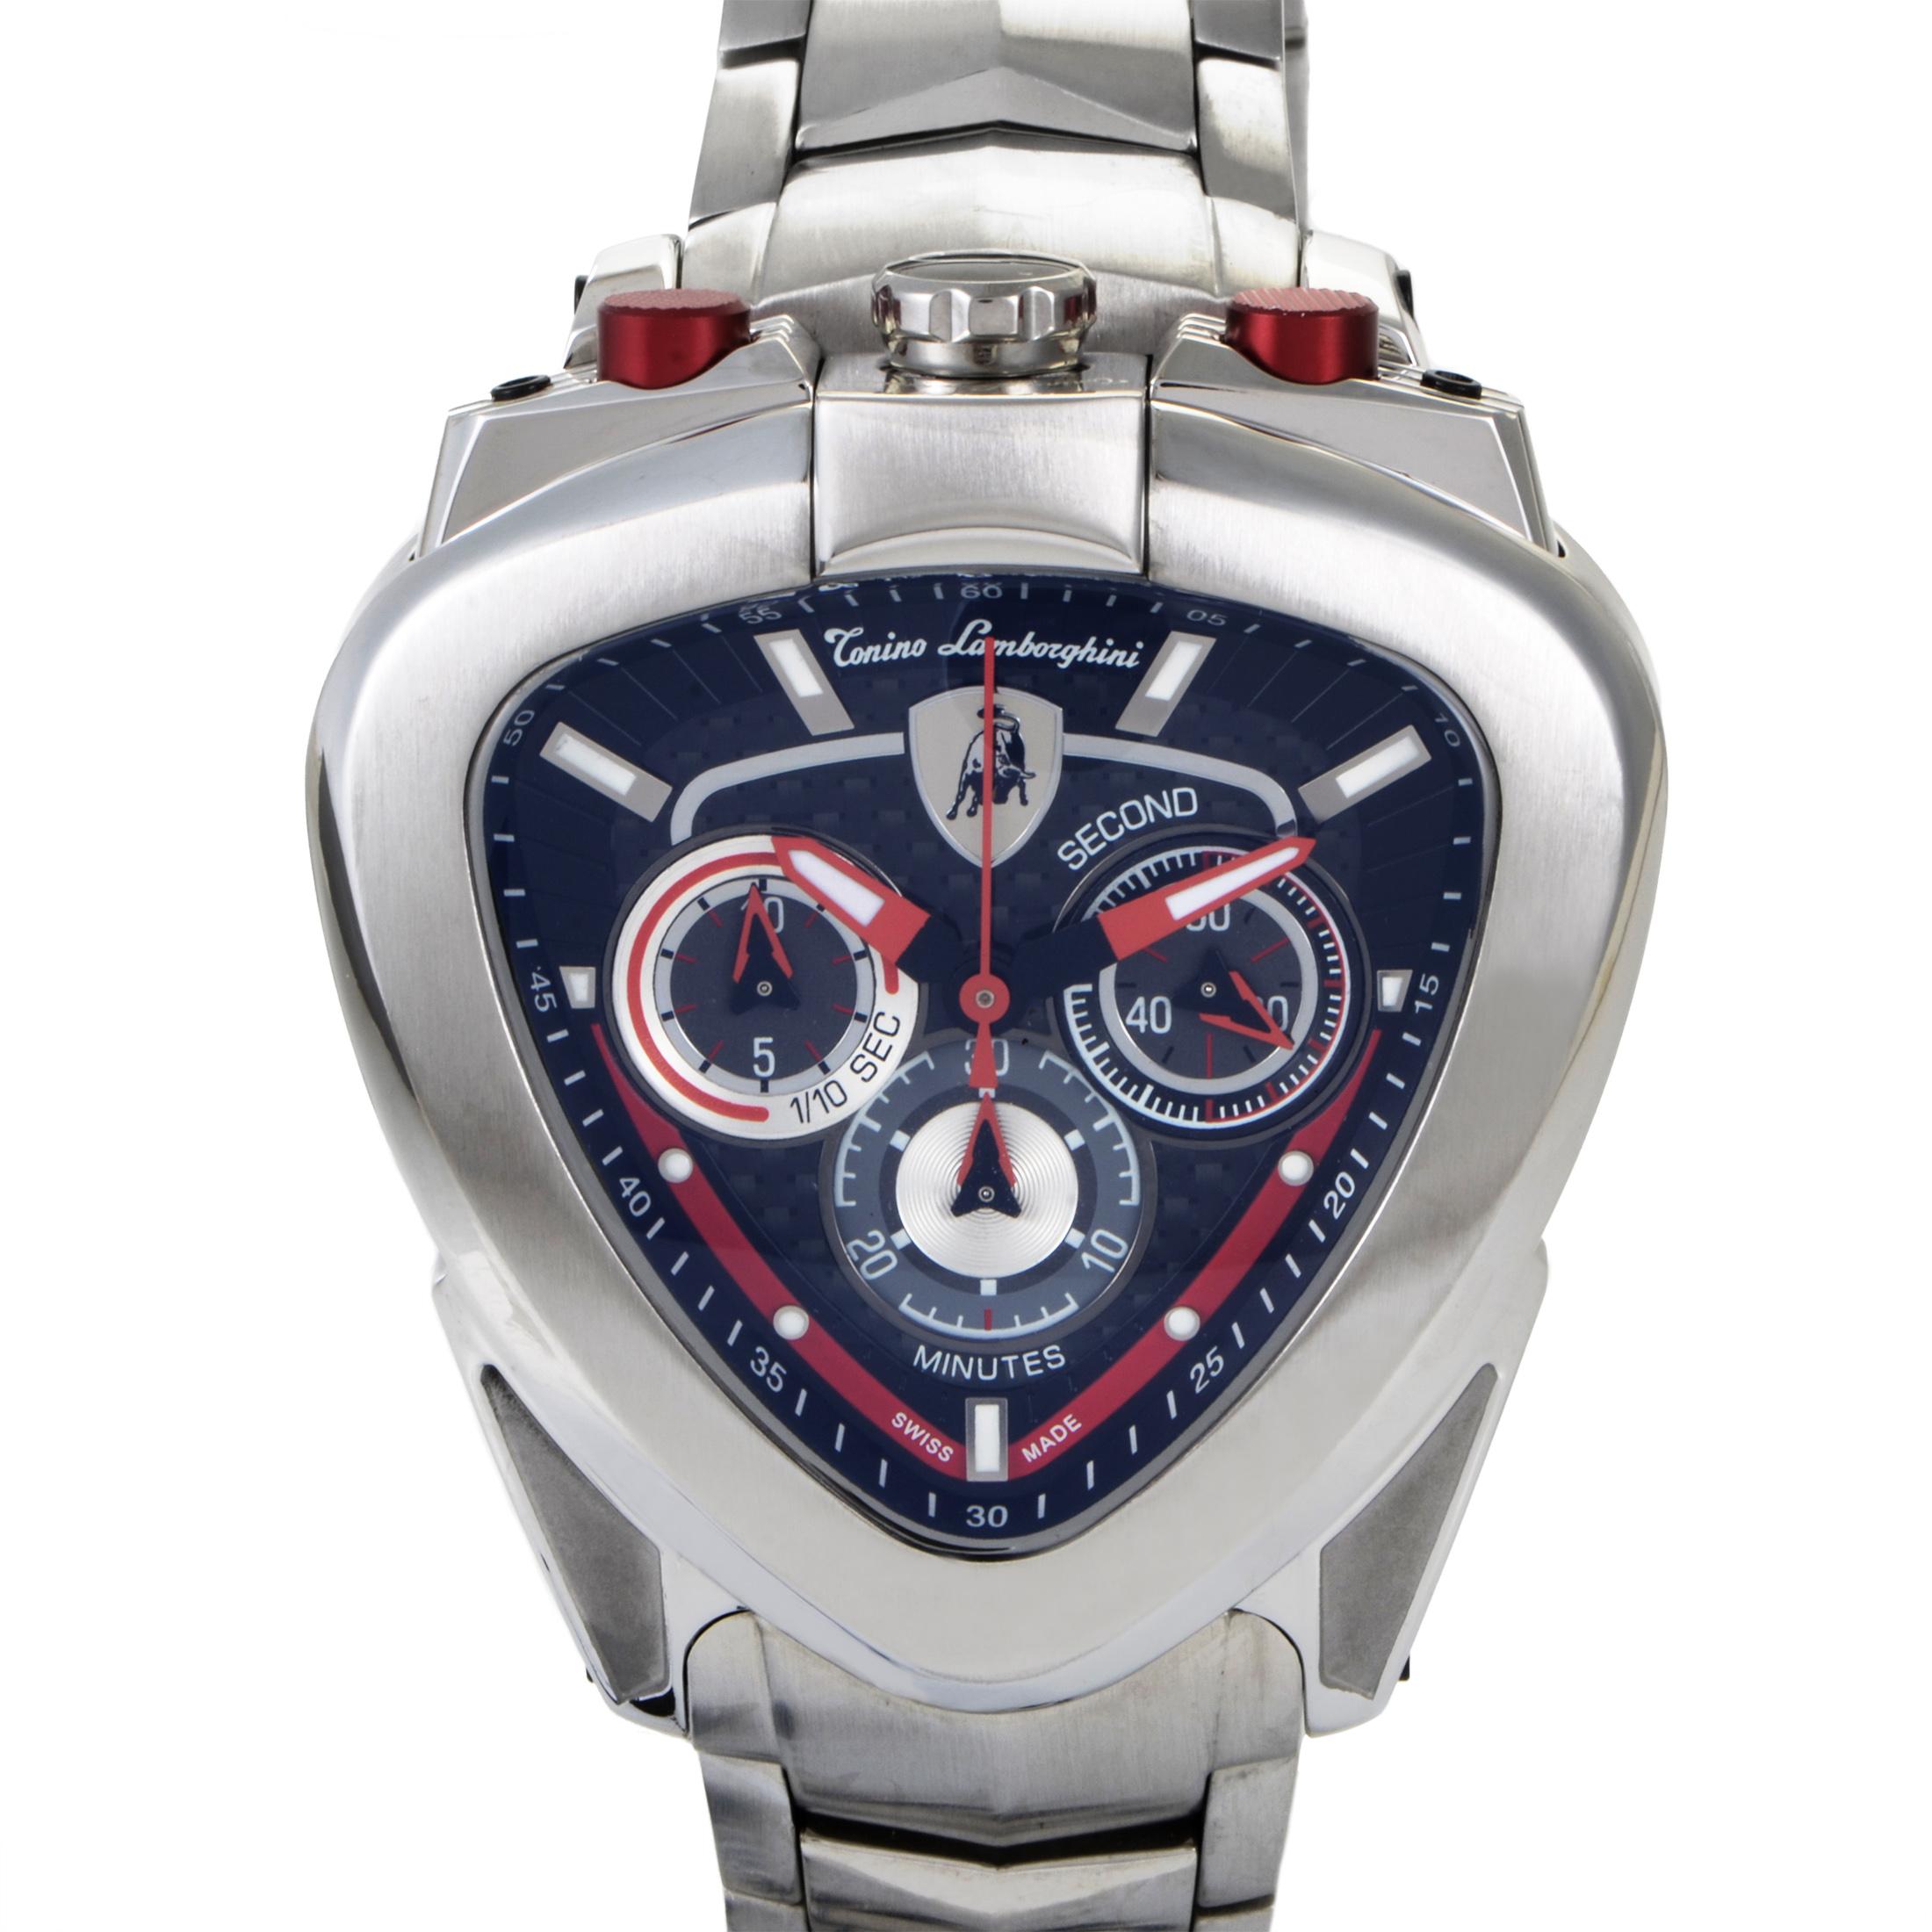 Spyder Men's Quartz Chronograph Watch 12H 12H-1